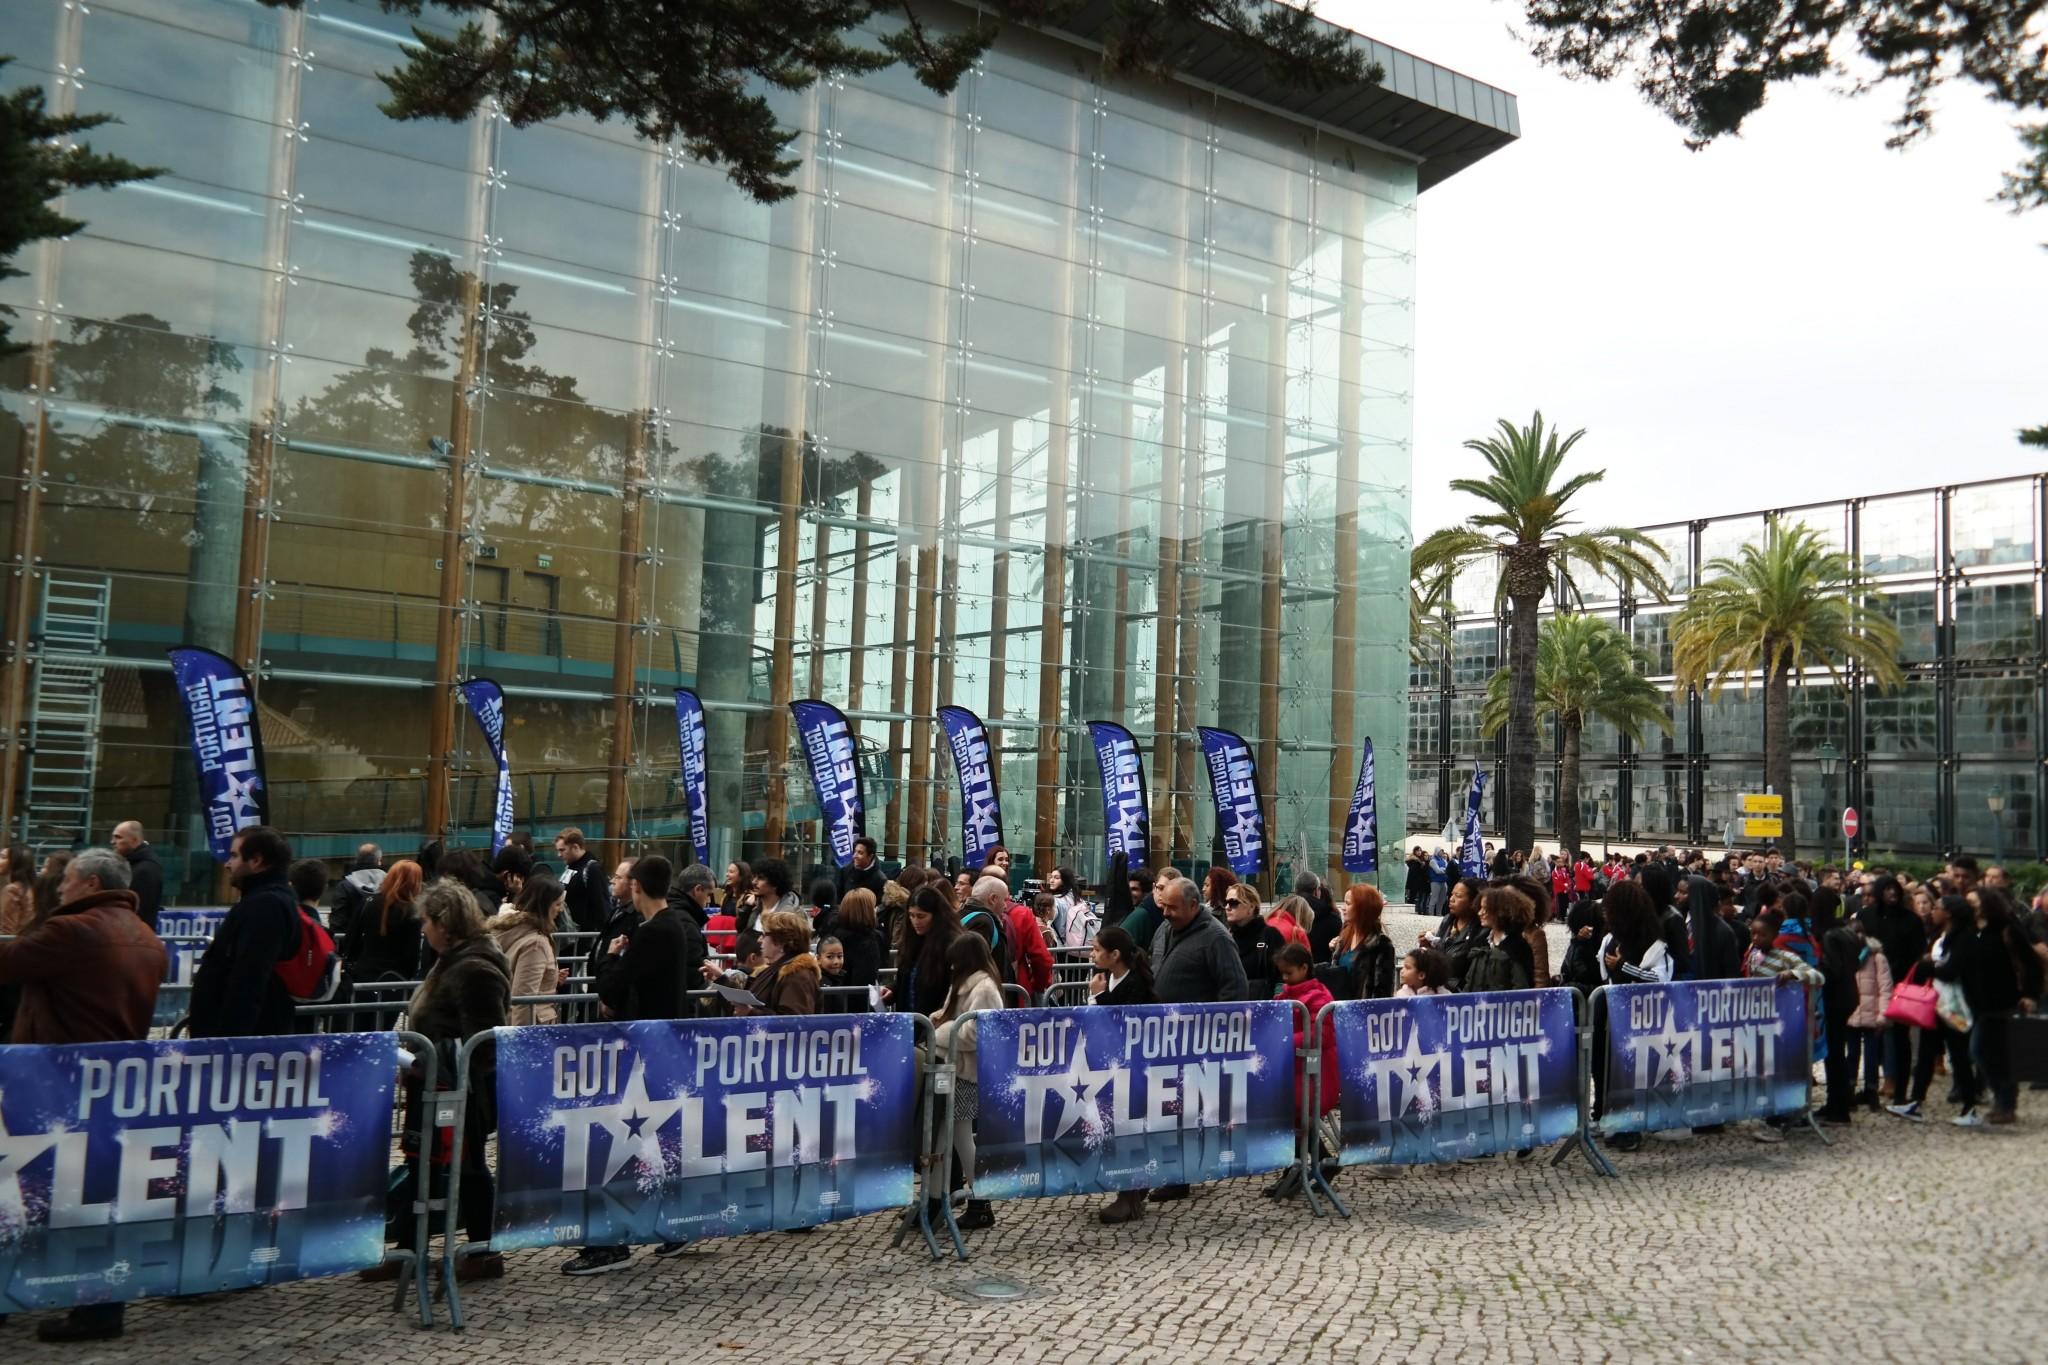 Got Talent Portugal 02 Estoril 013 «Got Talent Portugal»: Estoril Acolhe Mais De 3 Mil Candidatos [Com Fotos]